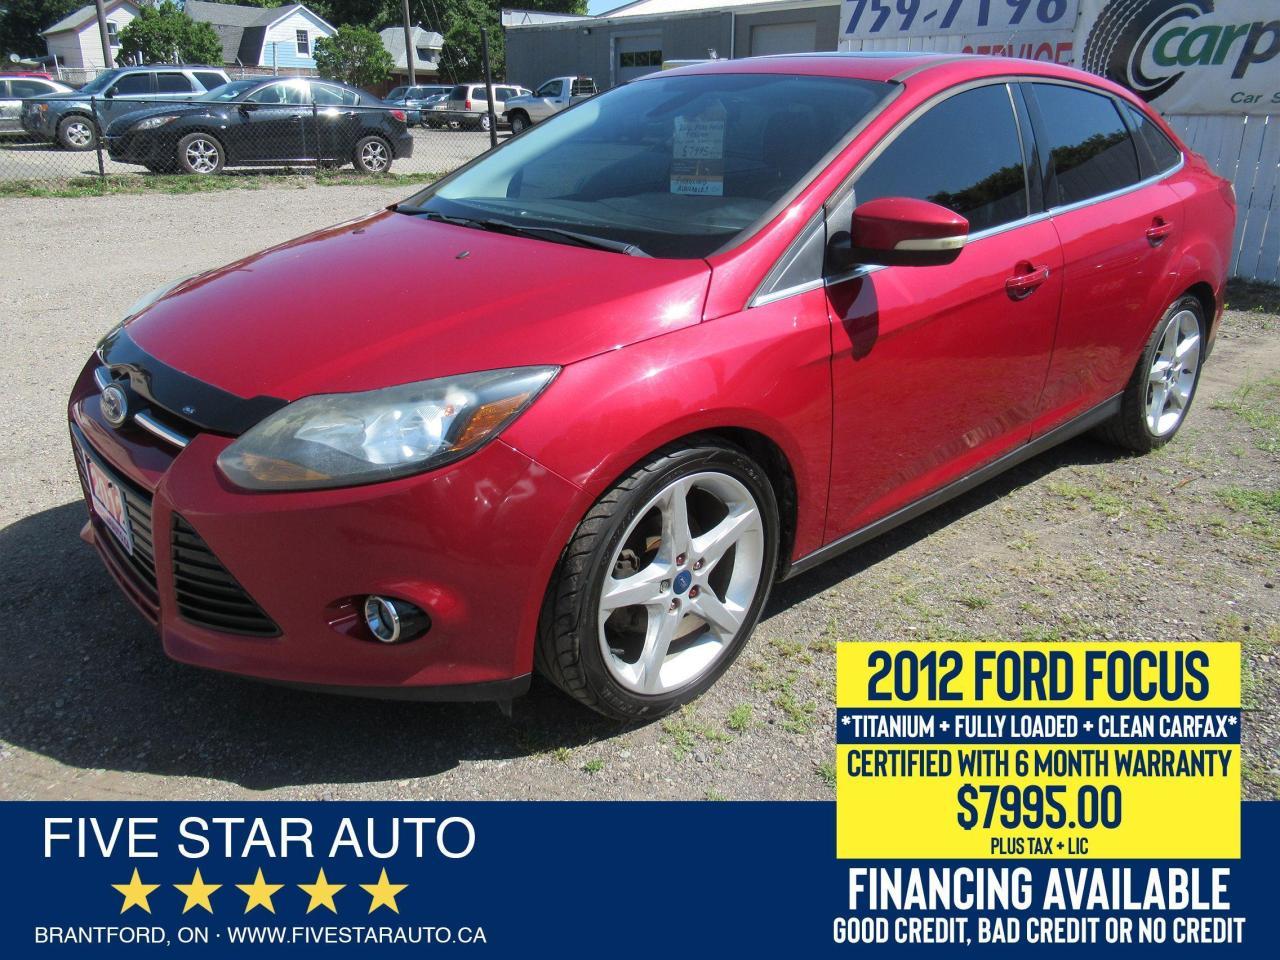 2012 Ford Focus Titanium *Clean Carfax* Certified + 6 Mth Warranty